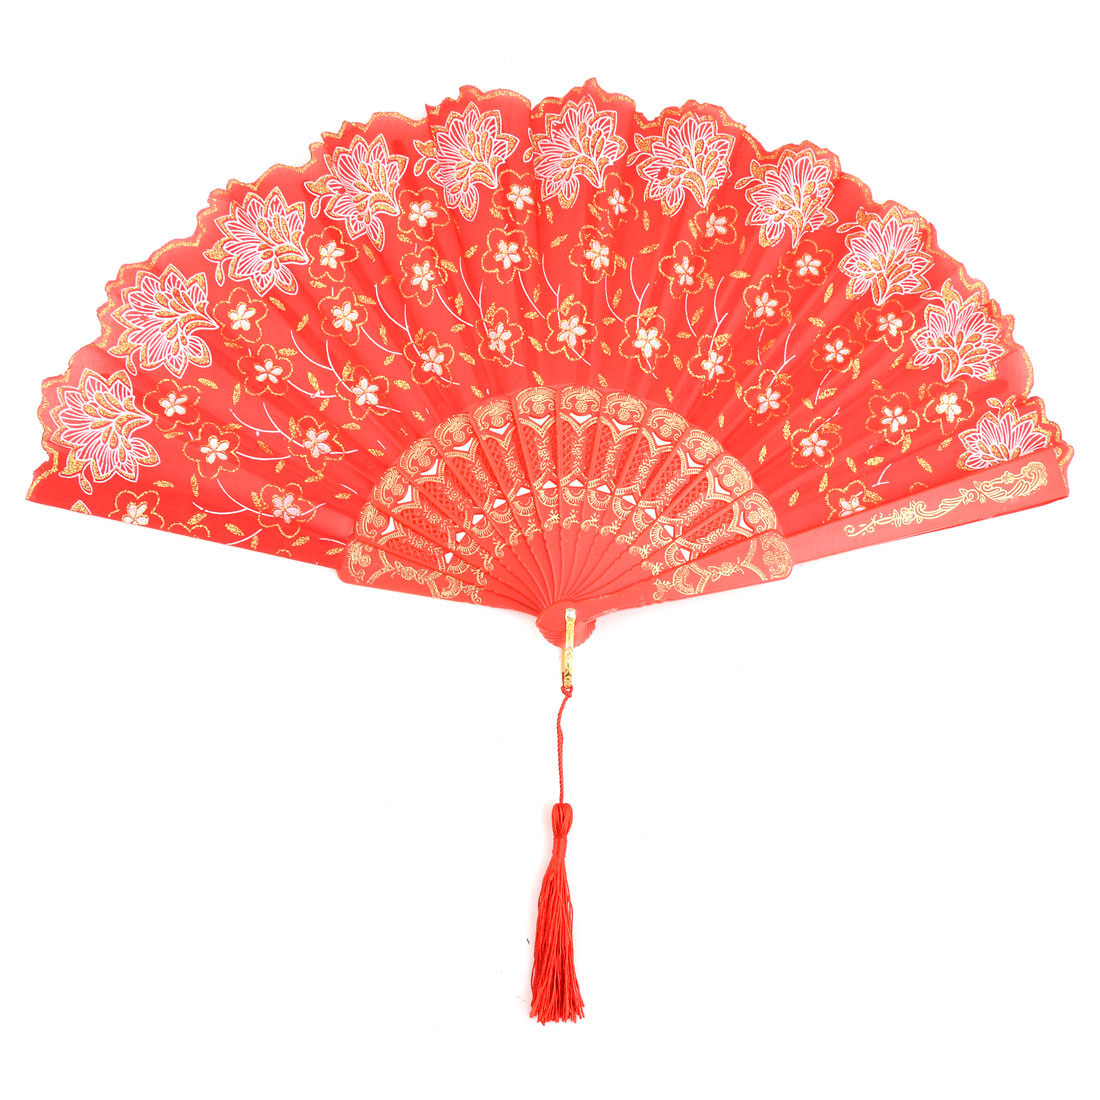 Gift Flower Pattern Tassel Decor Craft Handheld Summer Cooling Folding Fan Red